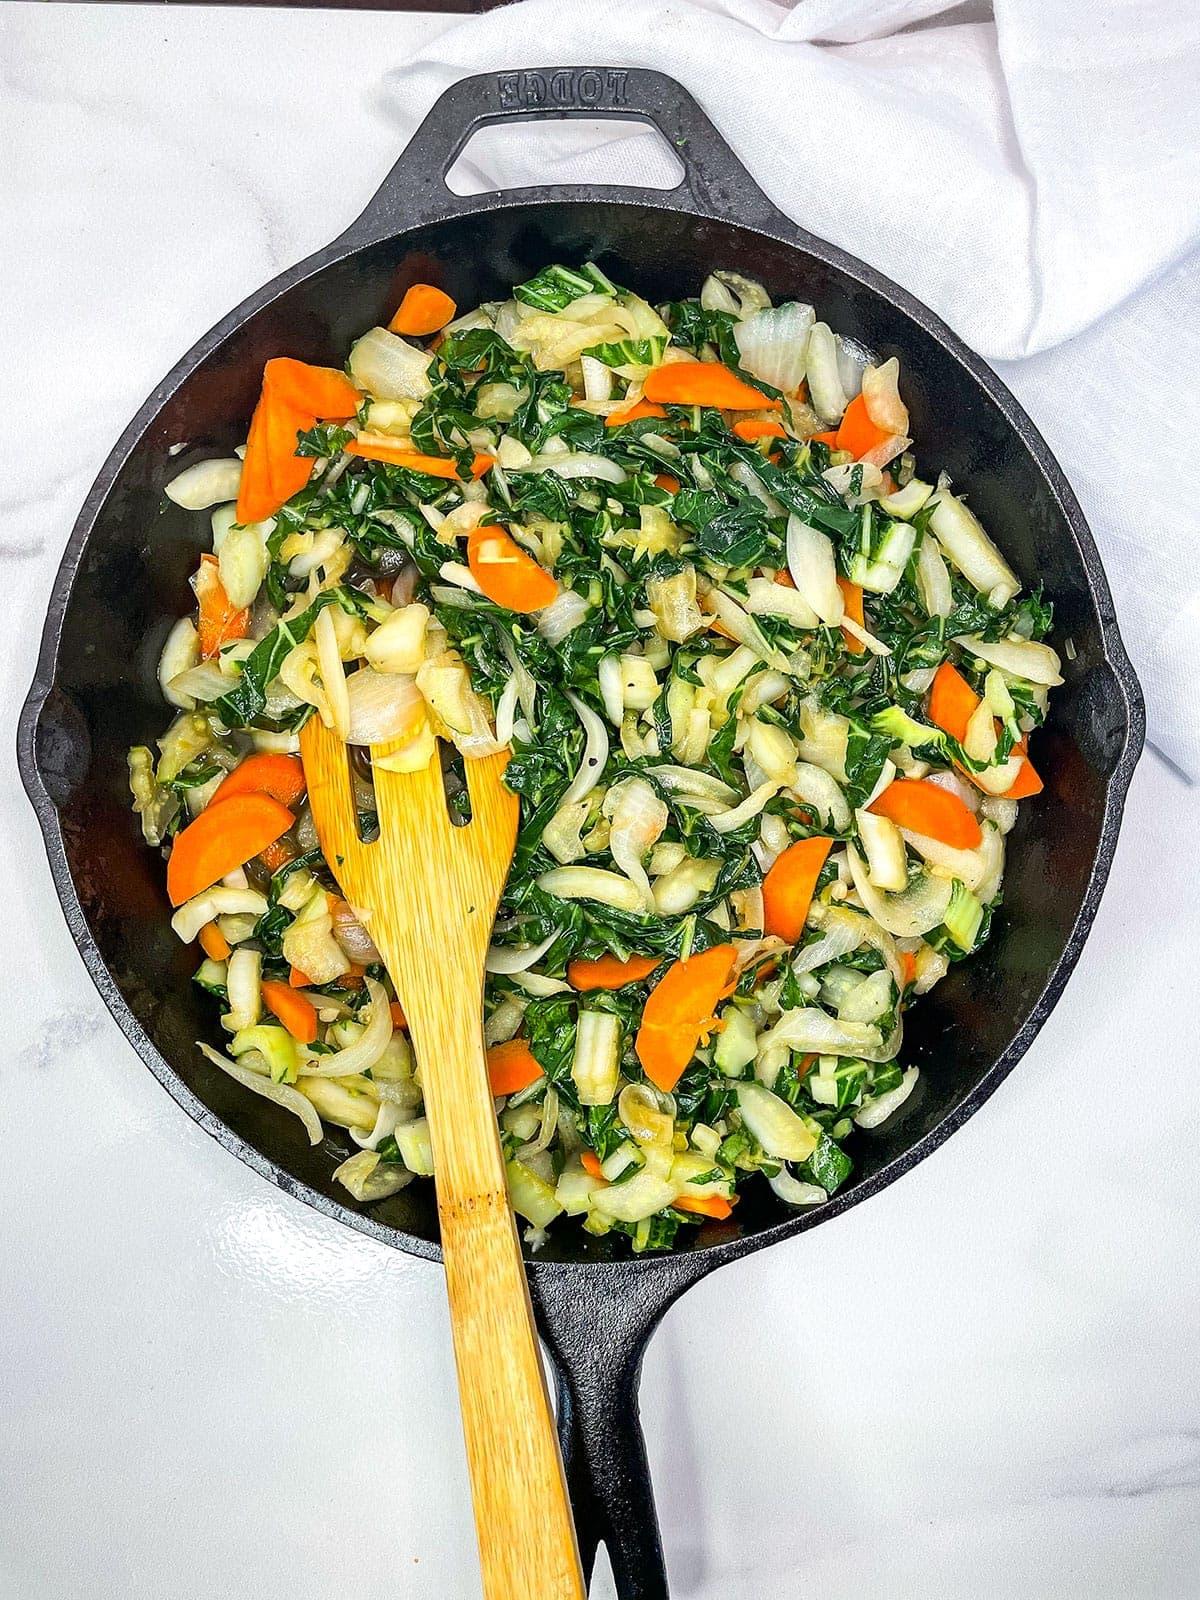 Overlay of Jamaican chop suey recipe